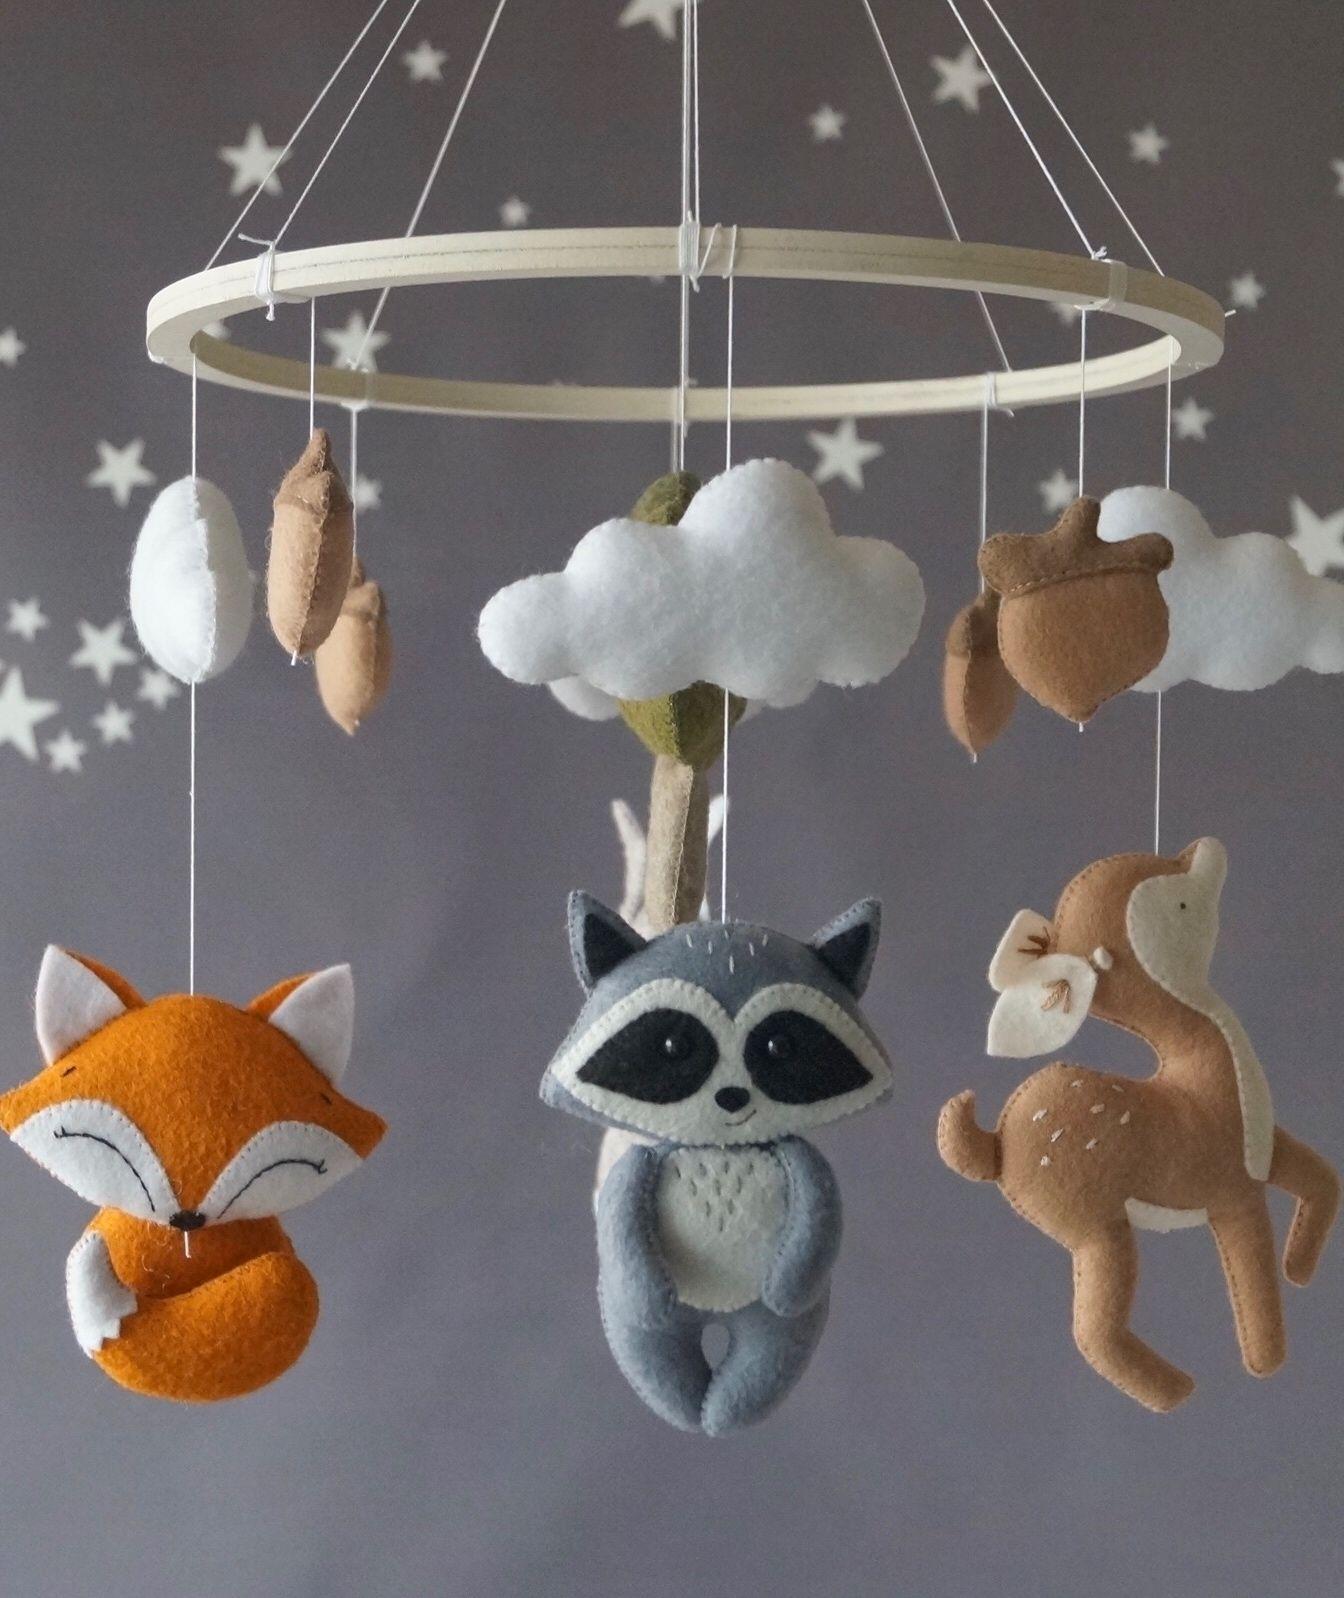 natural wood finish art craft Babies room DIY hanging mobile kit 8 arms